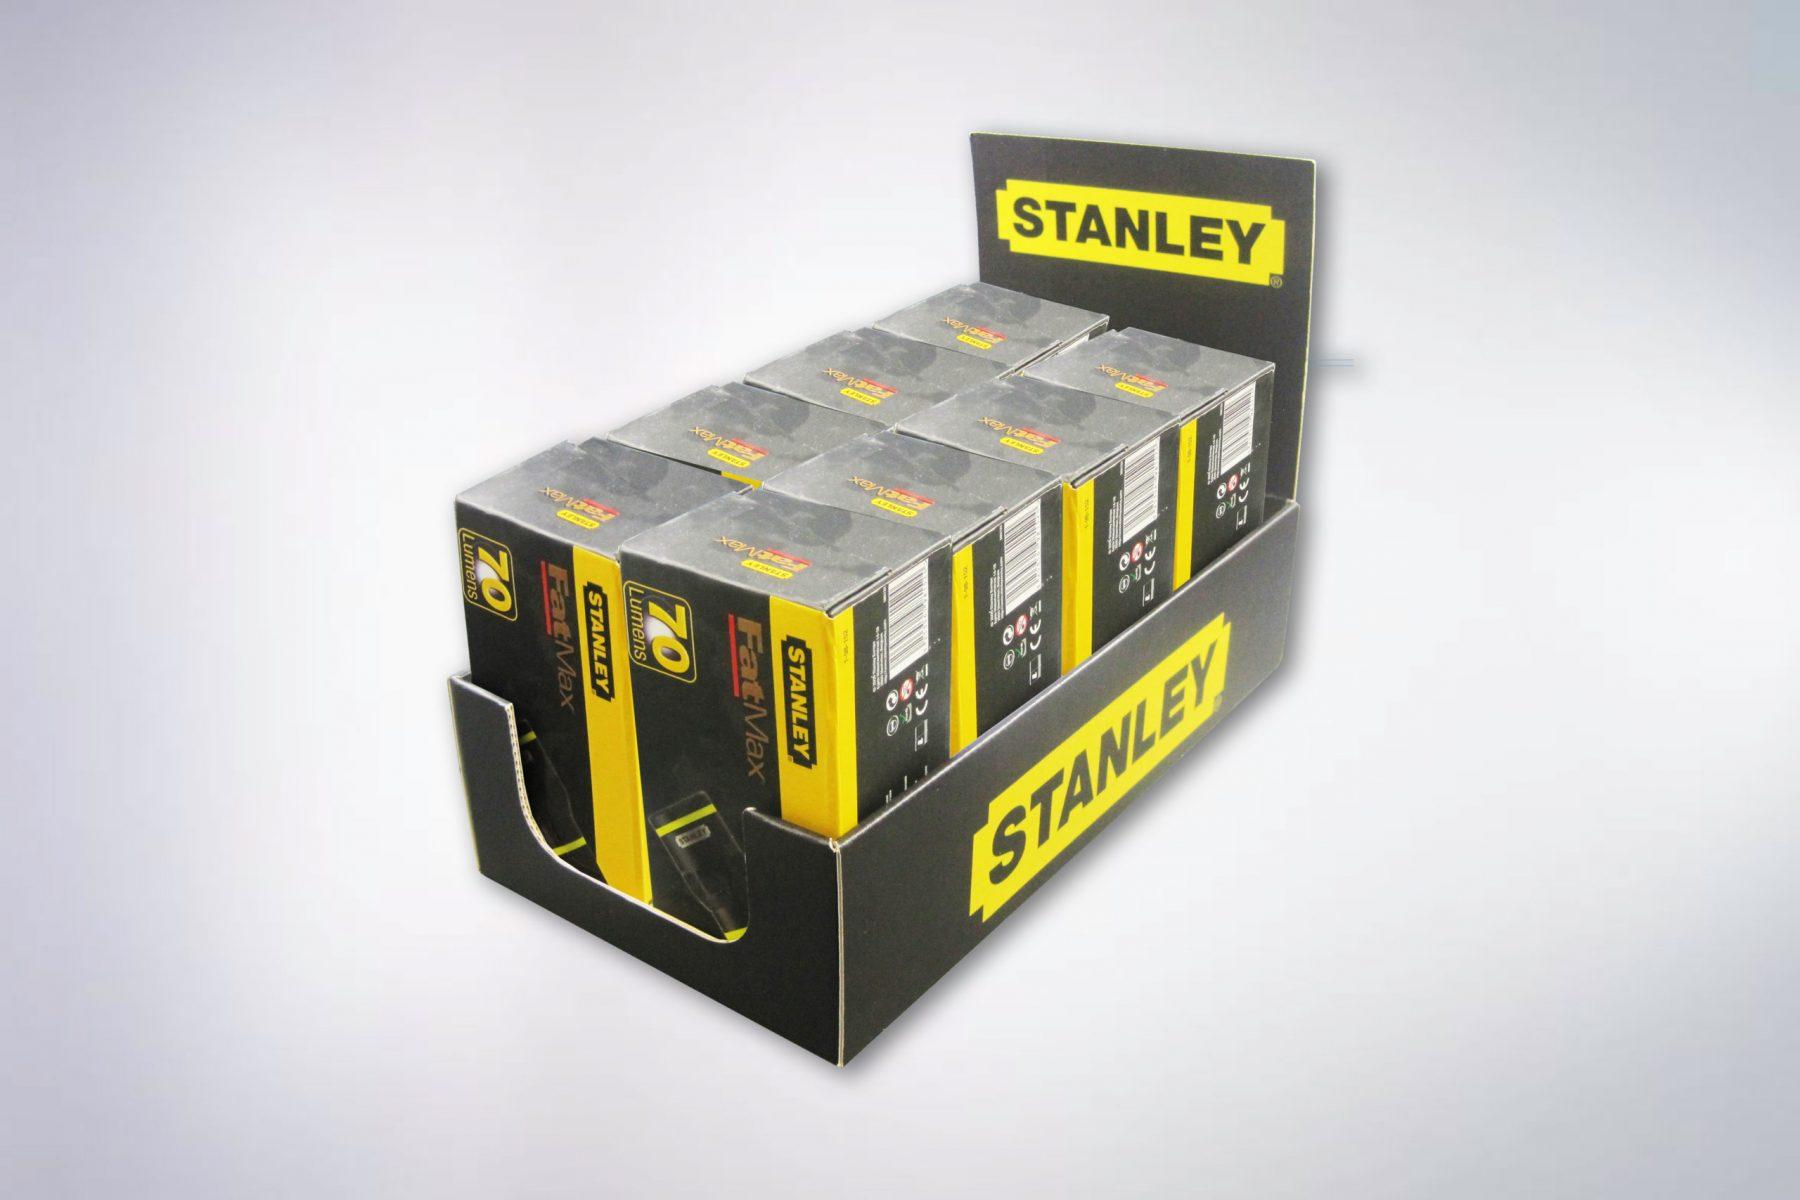 Stanley_Taschenlampe_Thekendisplay-scaled